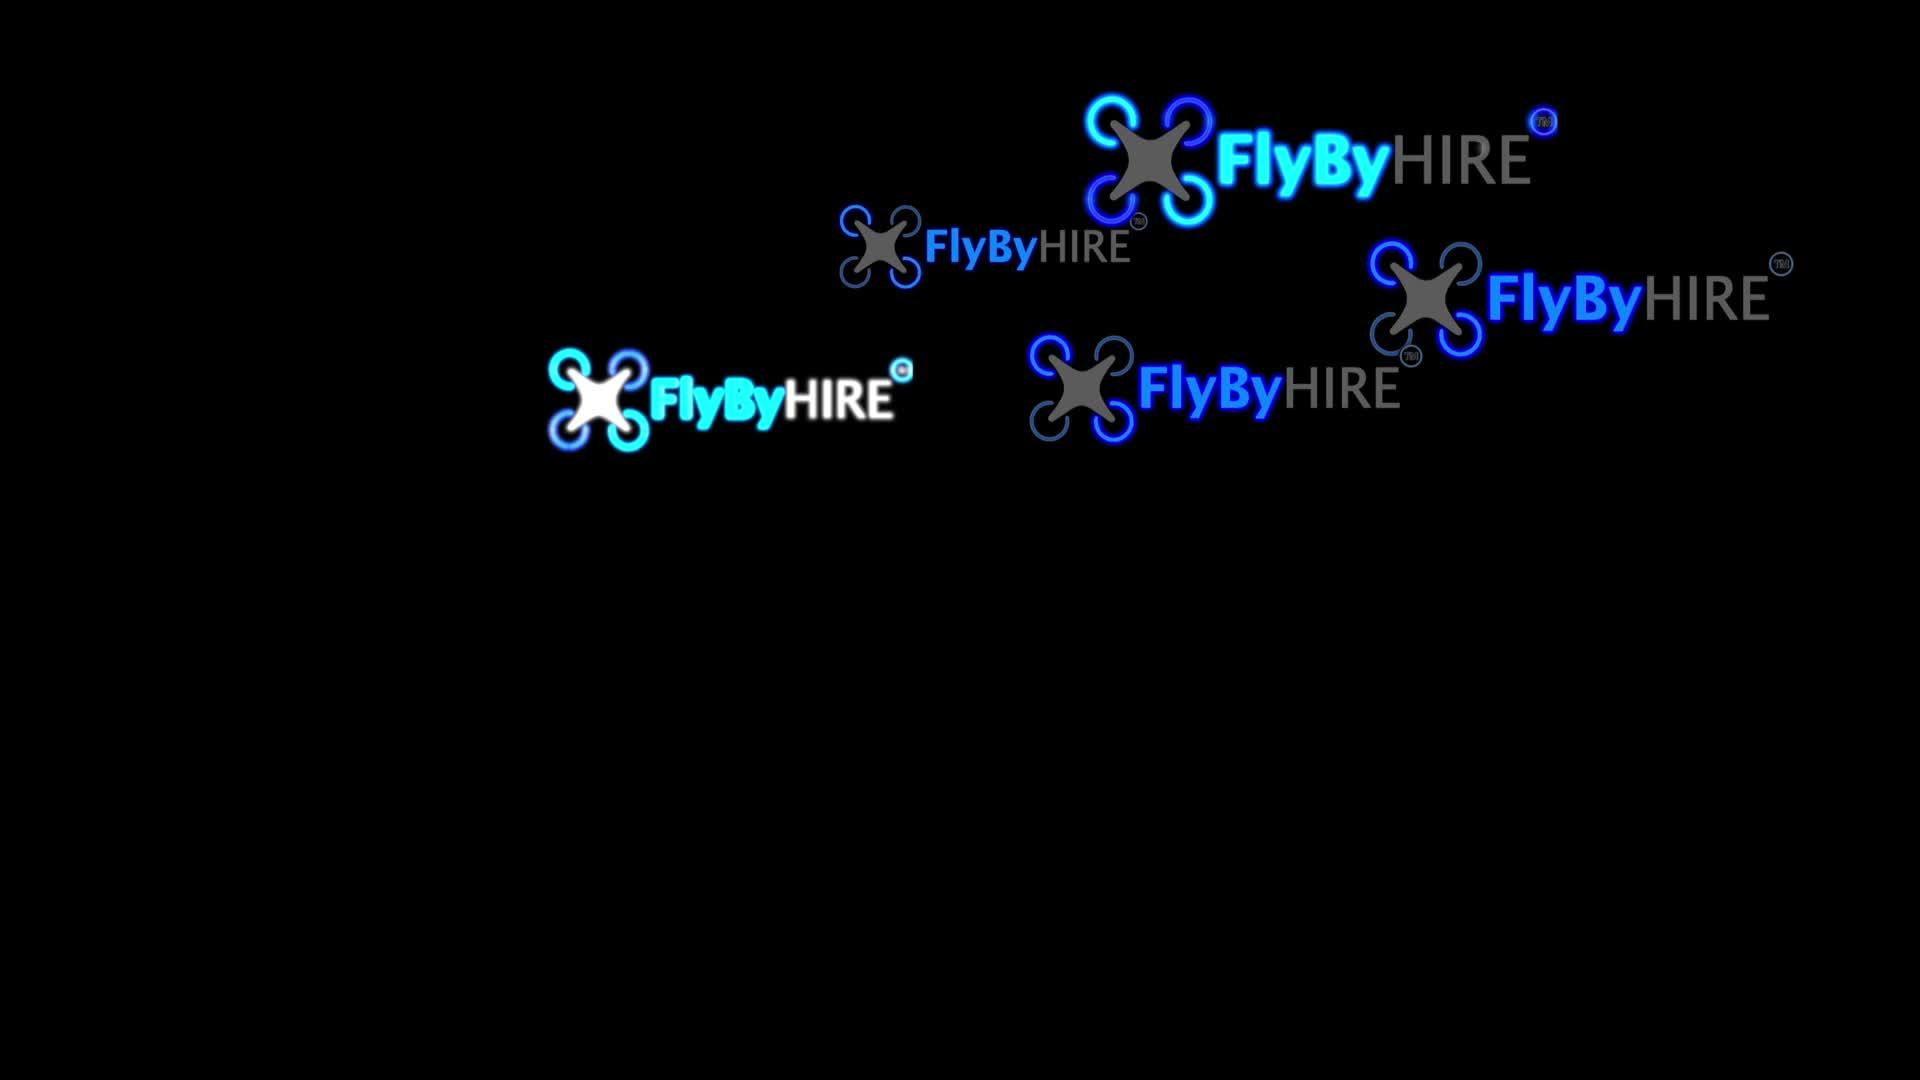 FLYBYHIRE LLC